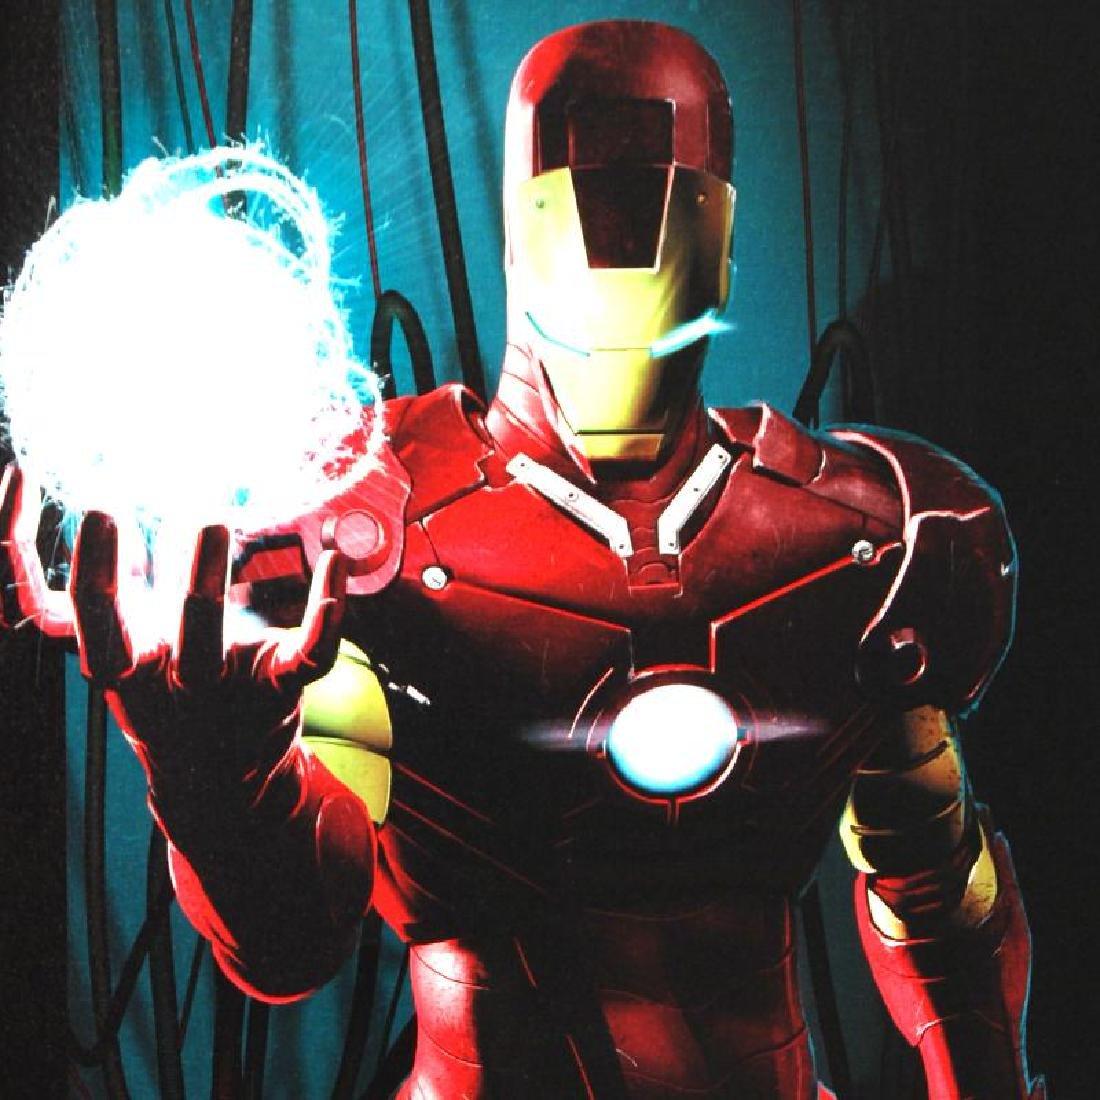 Ultimate Comics Ultimates #3 by Marvel Comics - 2